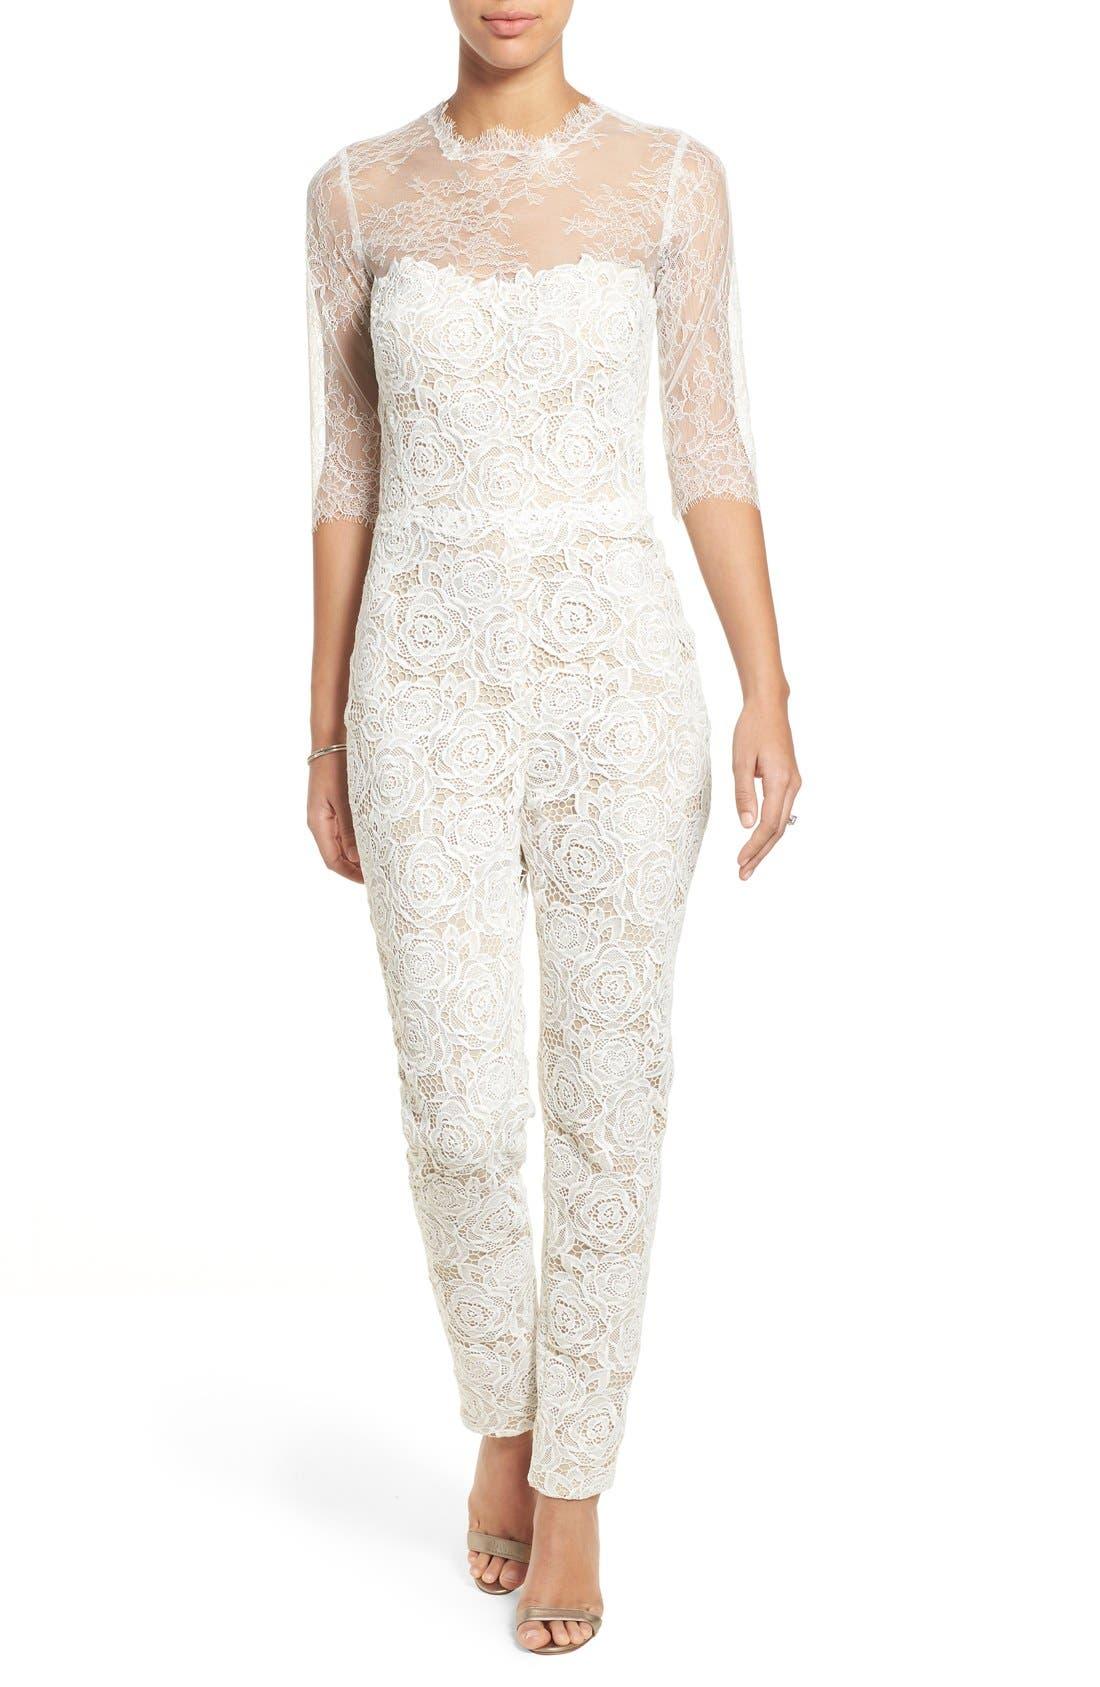 Main Image - Monique Lhuillier Ready to Wed Guipure Lace Jumpsuit